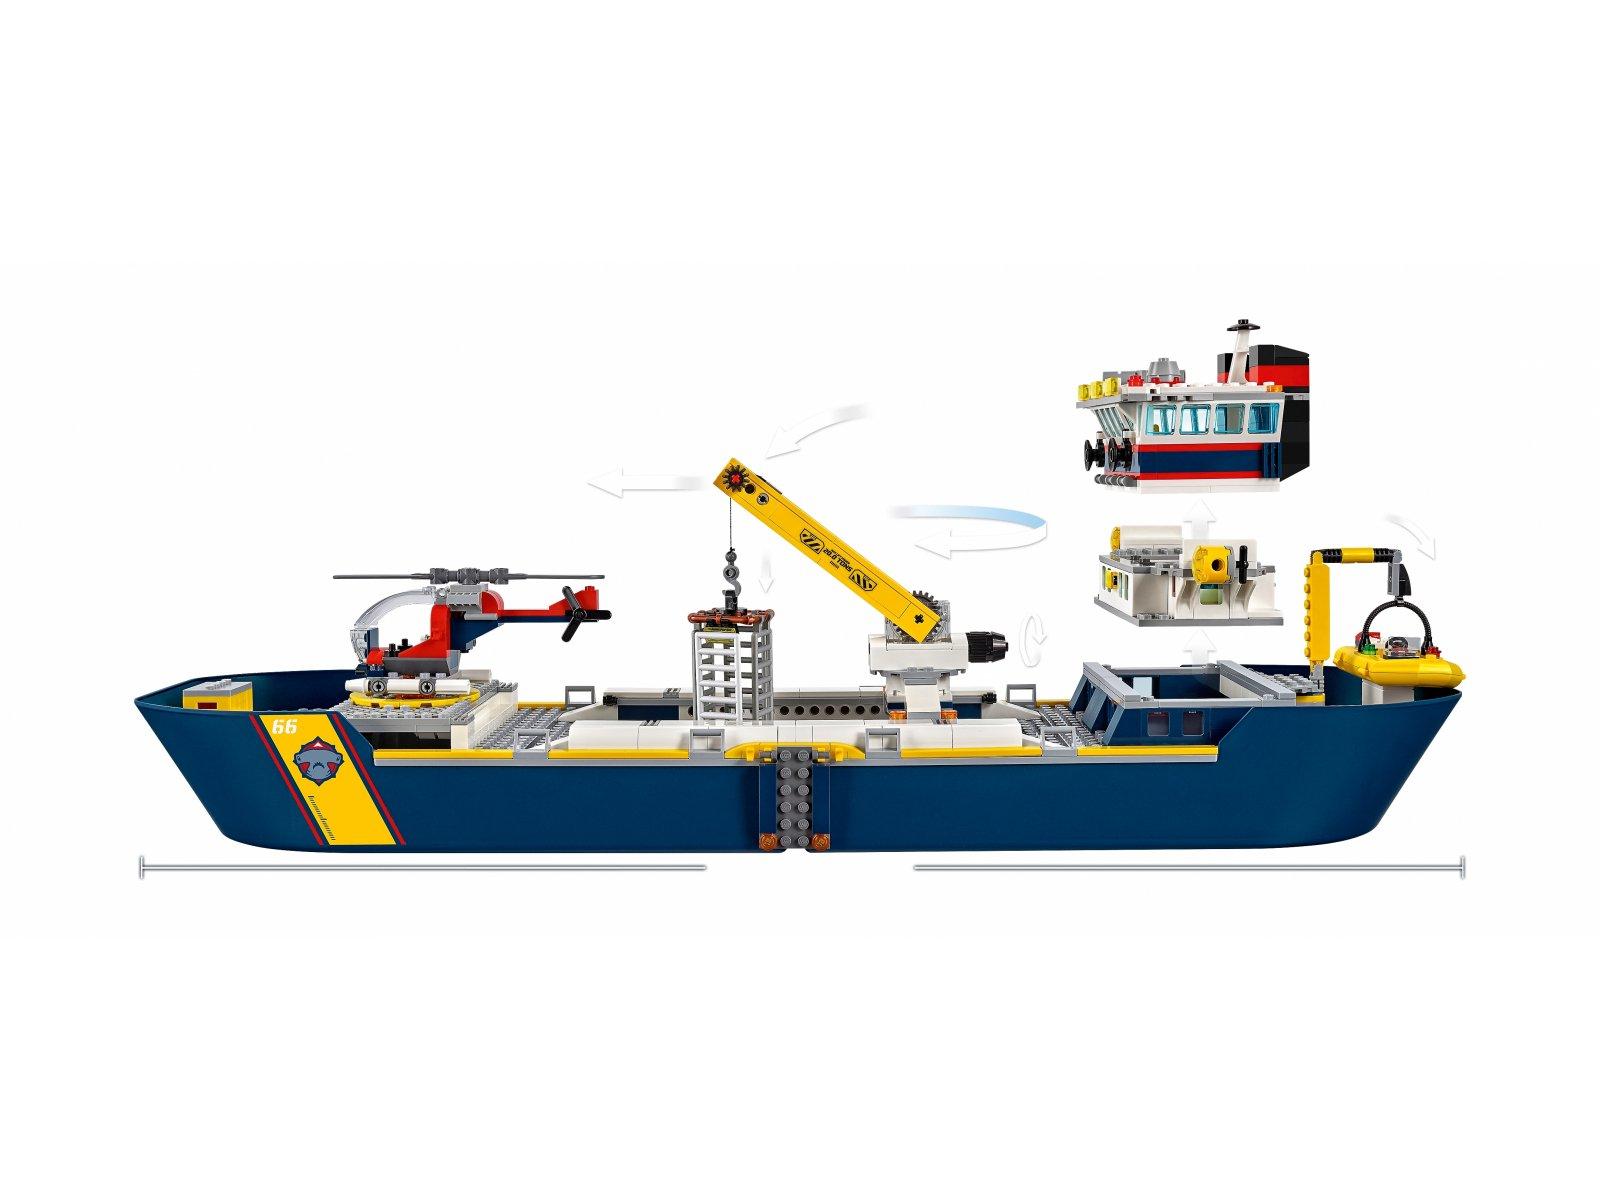 LEGO 60266 City Statek badaczy oceanu